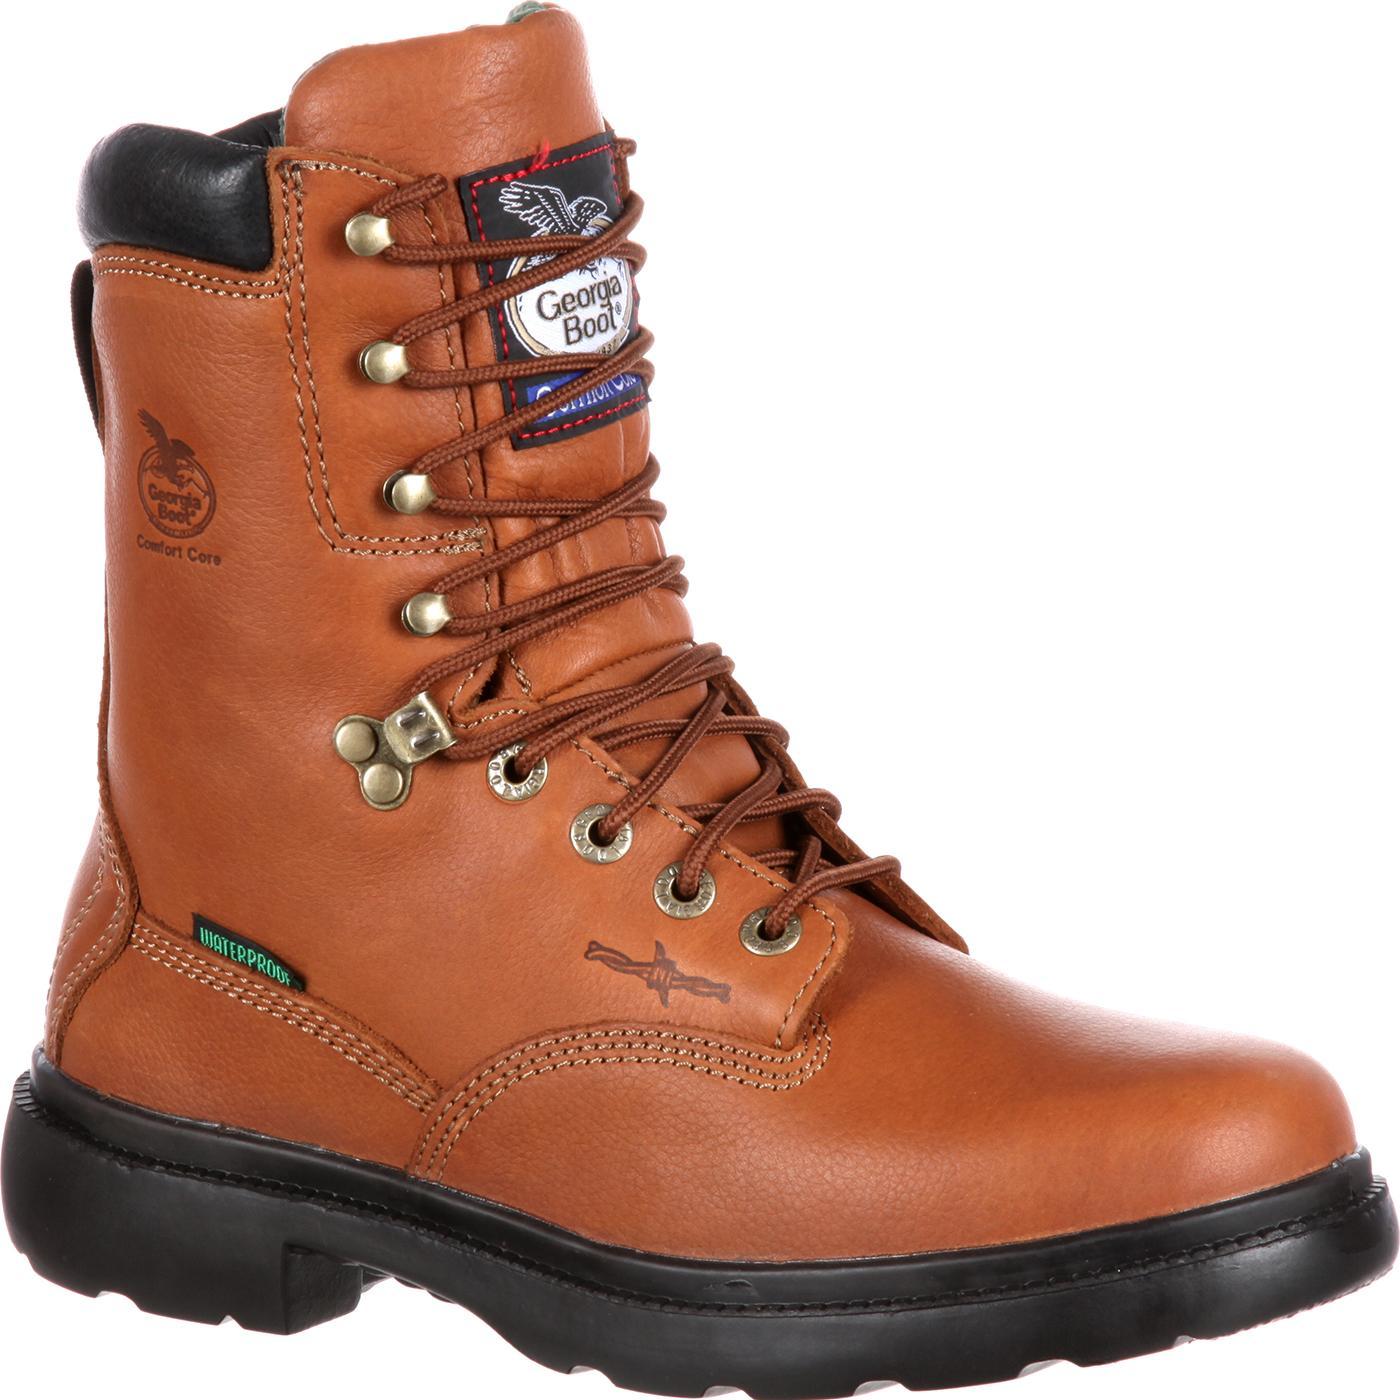 e8a38908d1bb3 Georgia Boot  Men s Farm   Ranch Comfort Core® Work Boots - Style  G8503